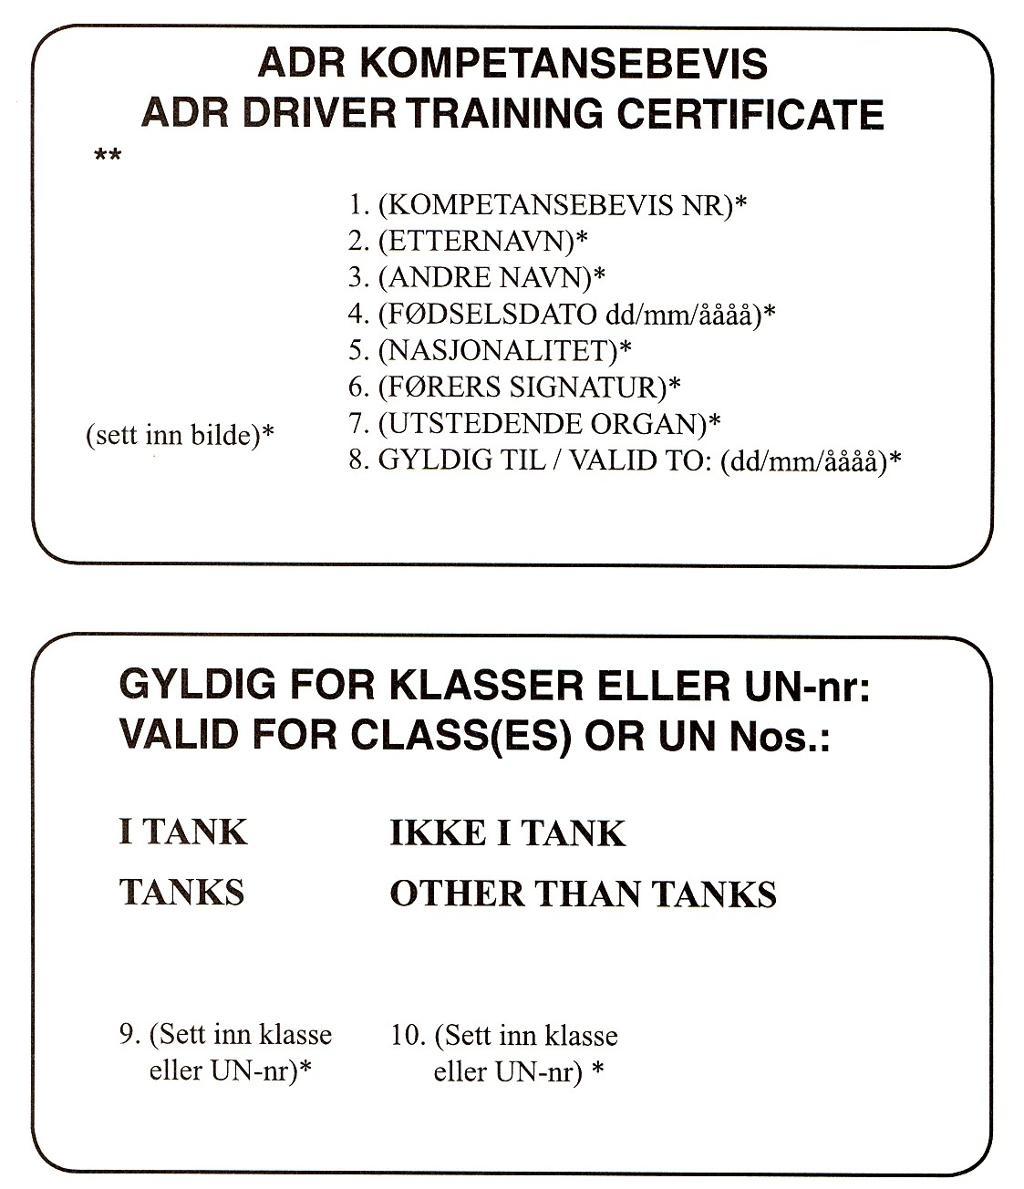 Malen til det nye ADR-kompetansebeviset